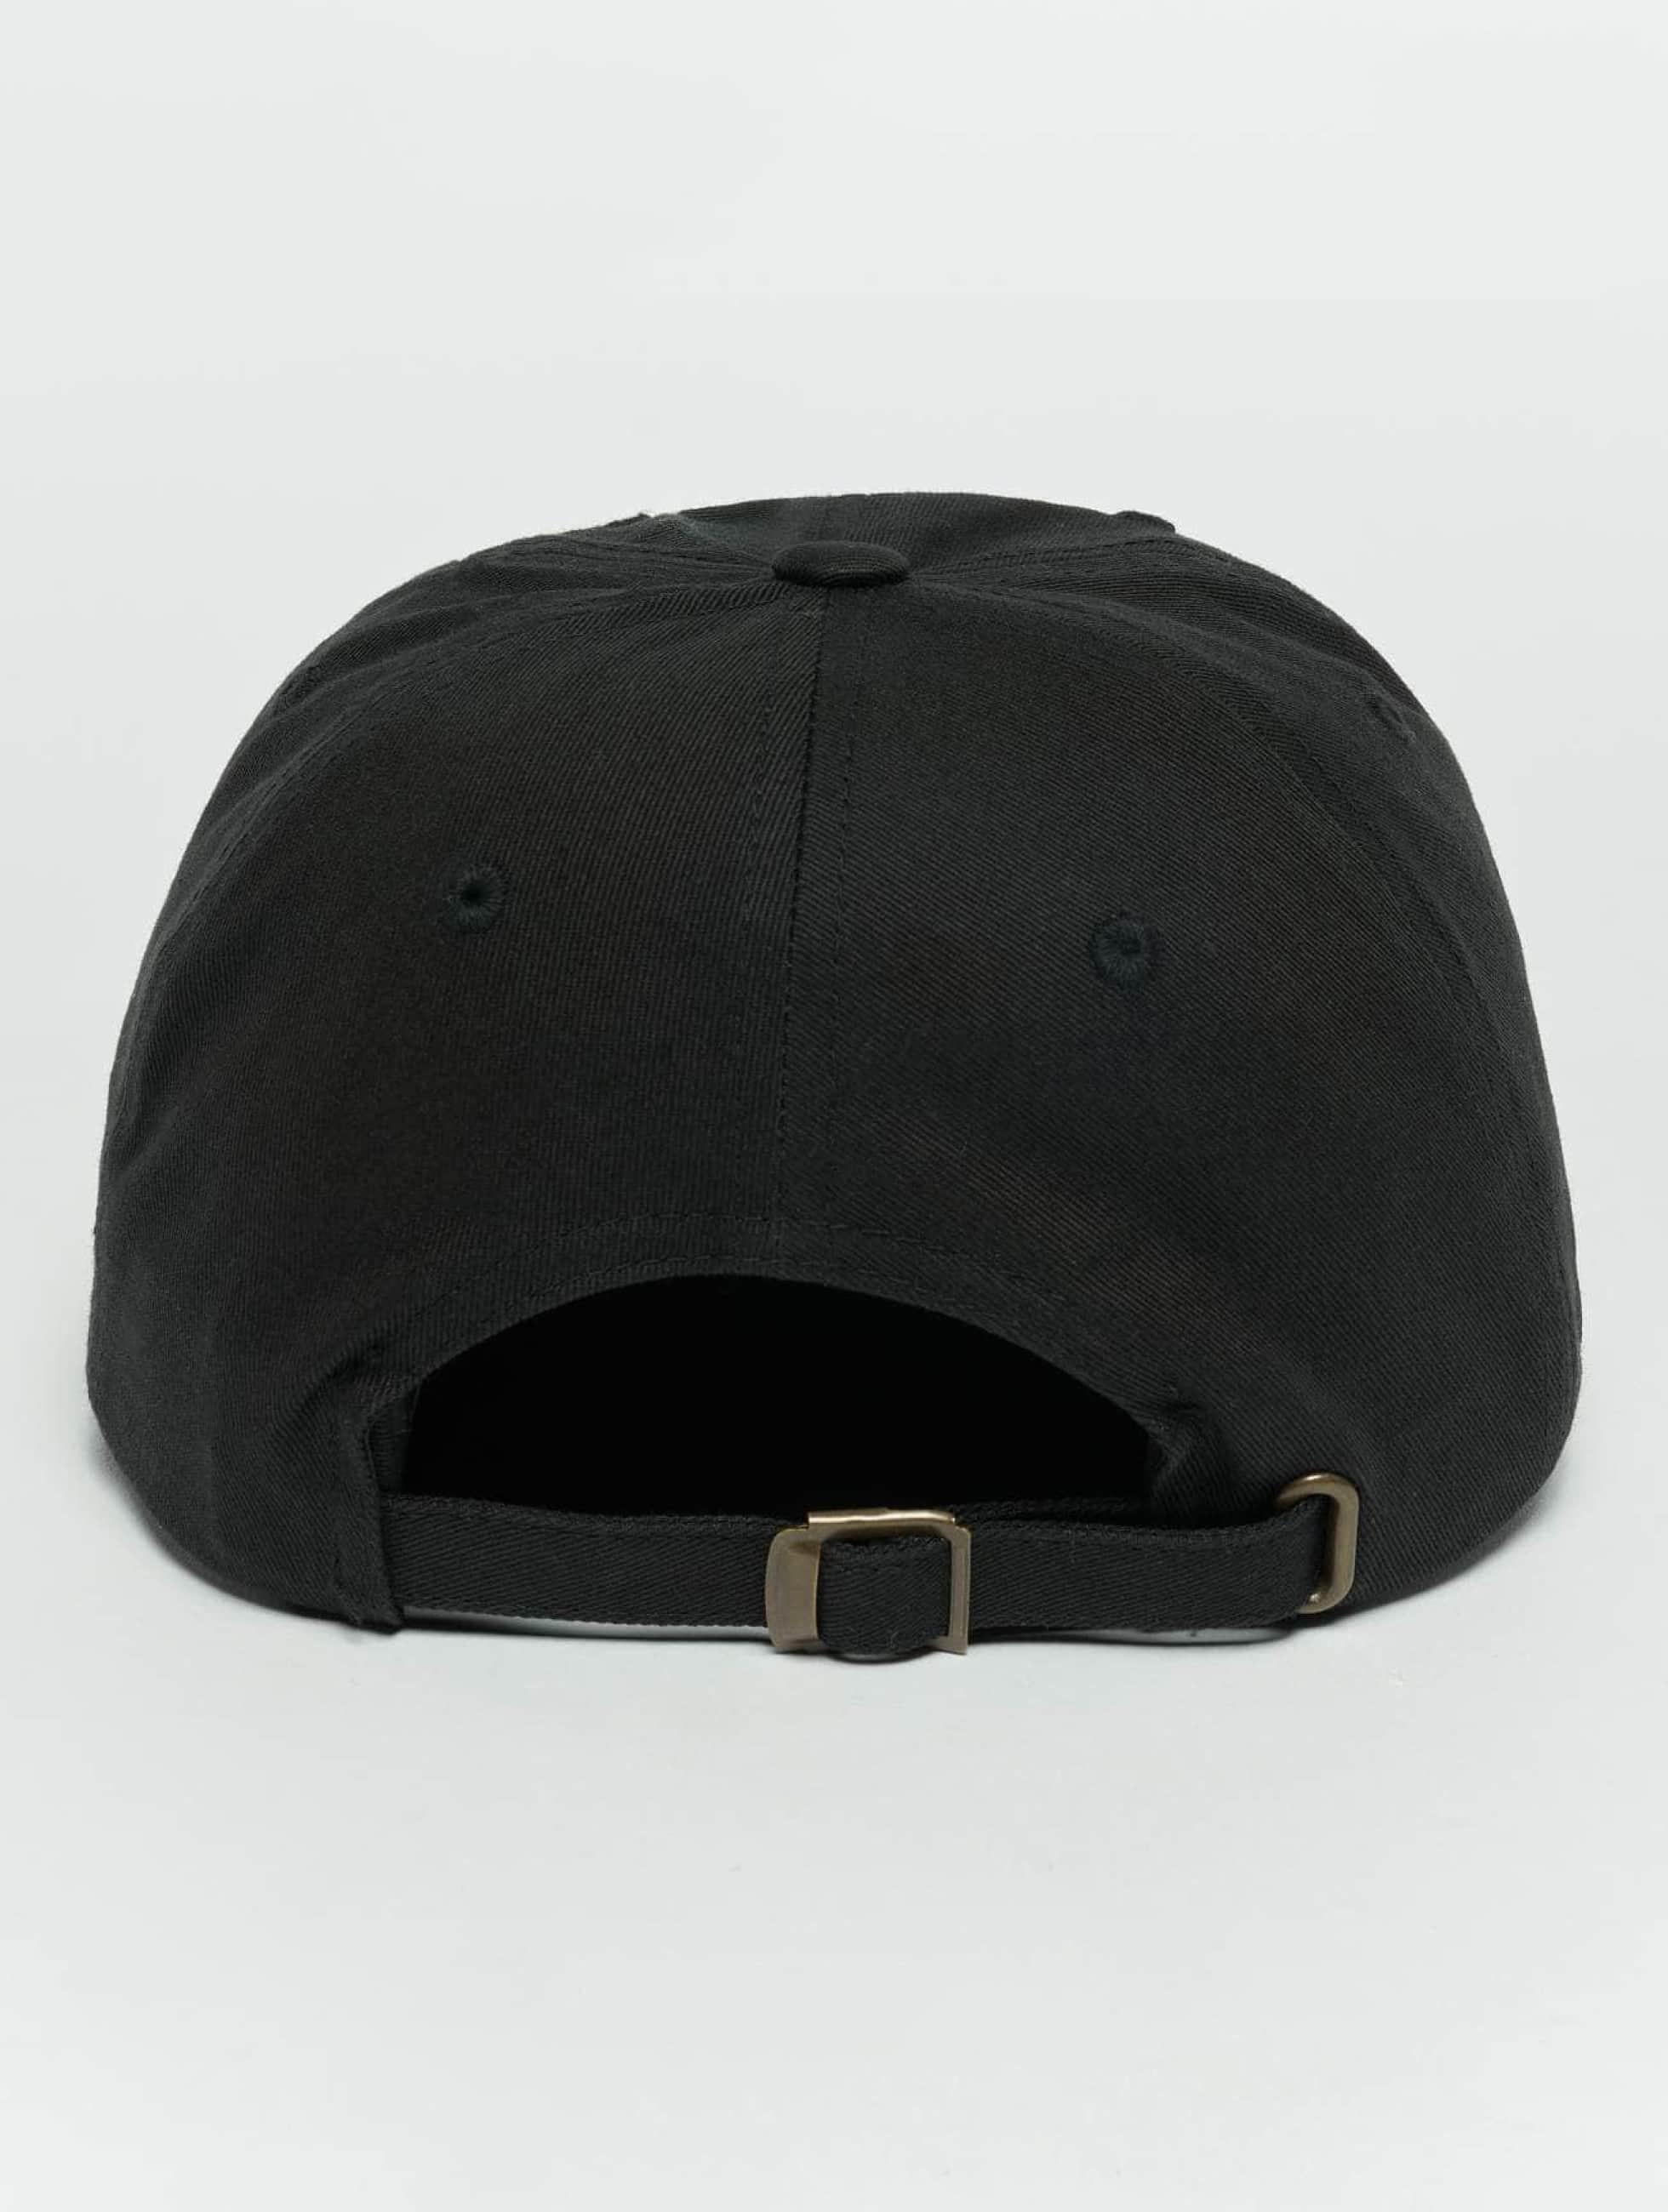 TurnUP Snapback Caps Whatever czarny